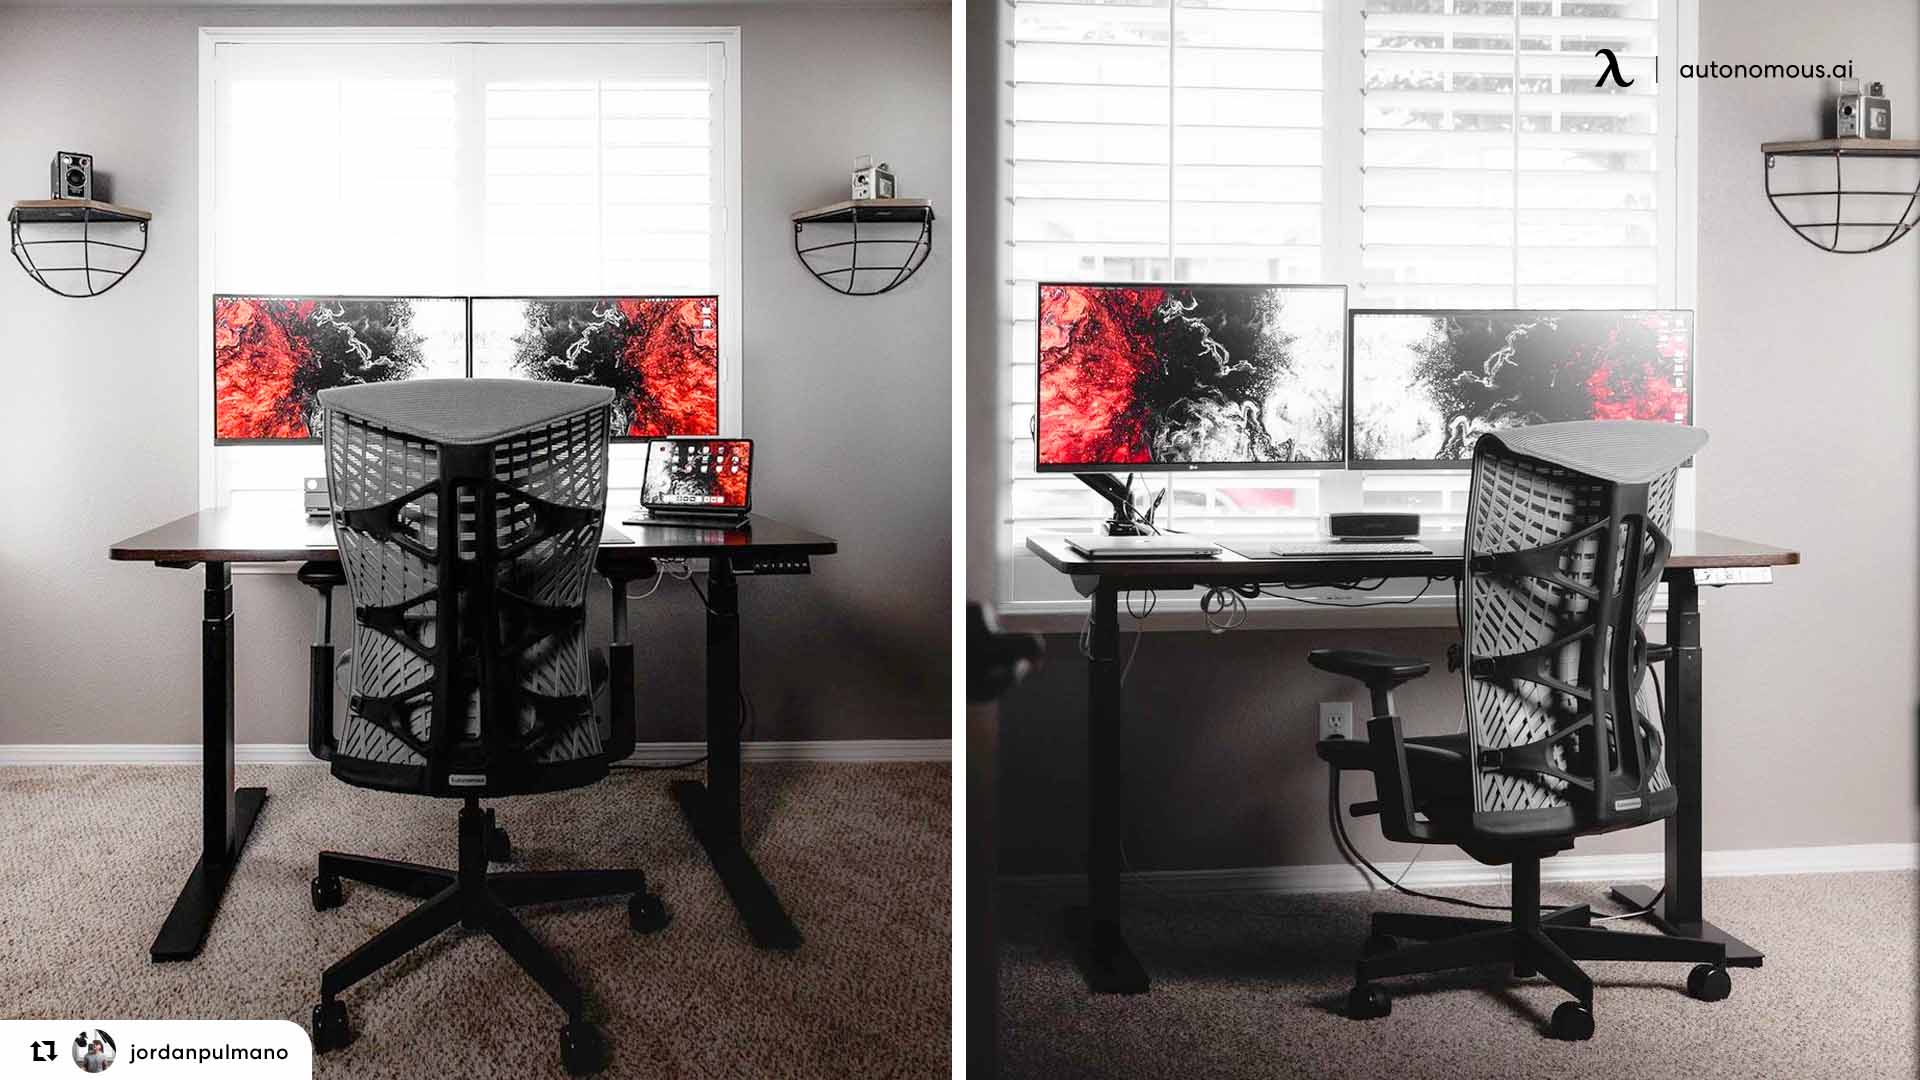 Remember the Ergonomic Chair